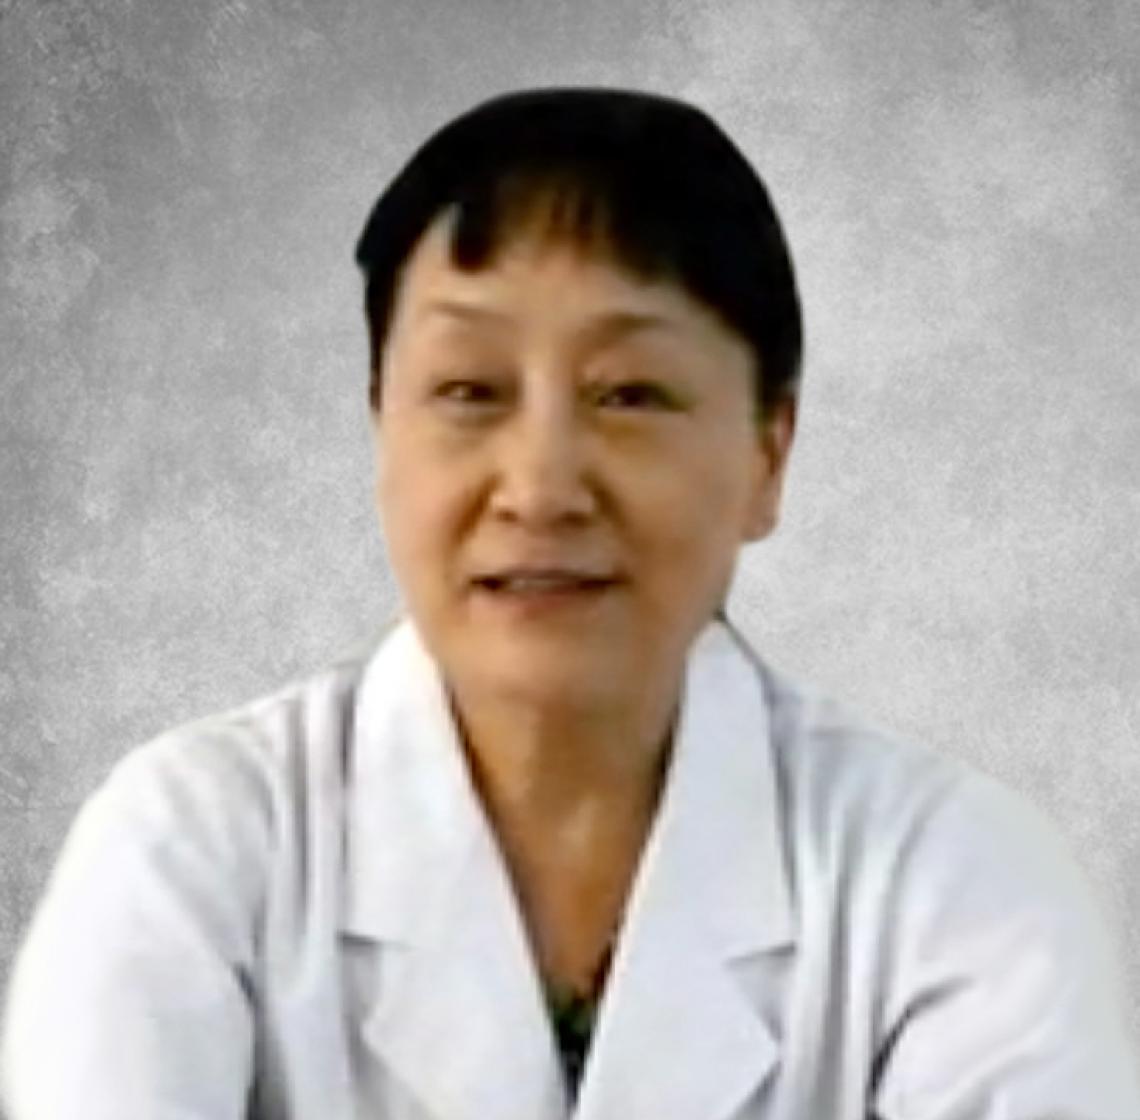 Professor Liu Sao Qing